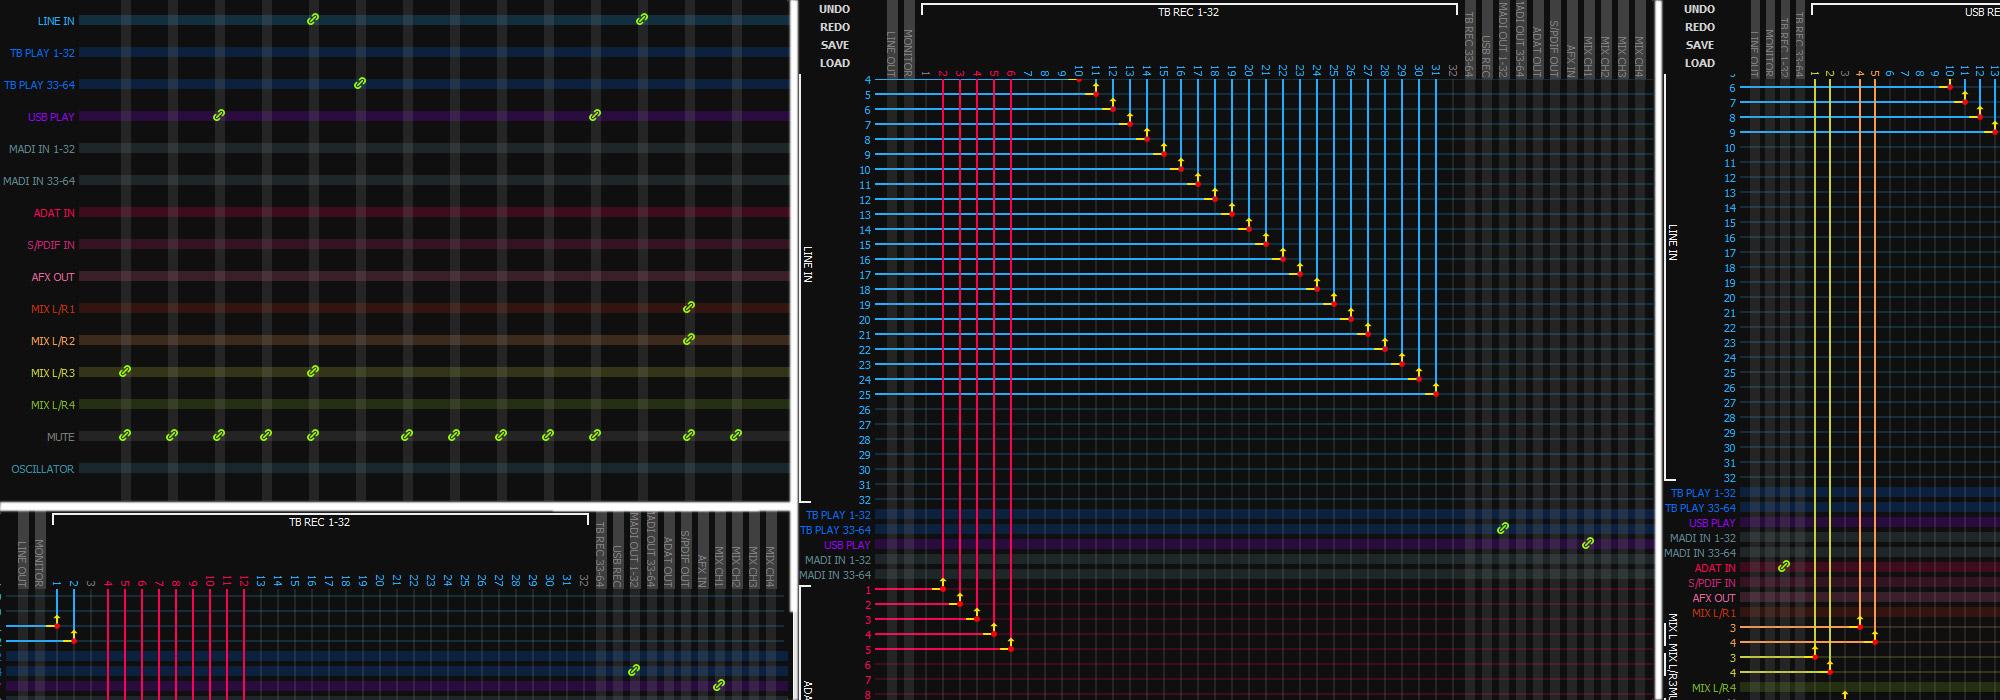 New Antelope Audio Routing Matrix